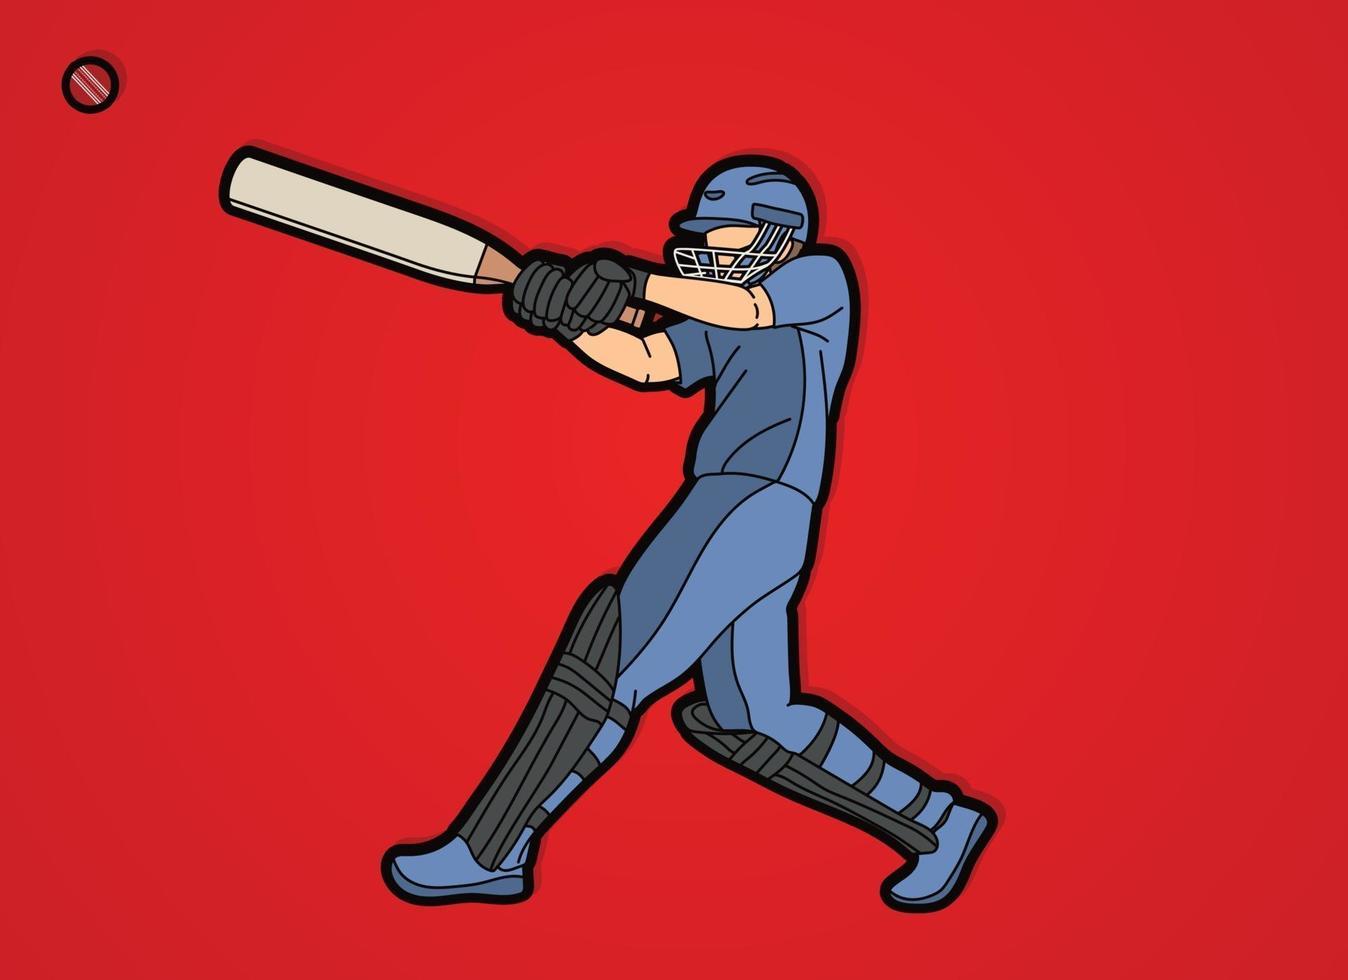 Cricketspieler trifft Ballaktion vektor